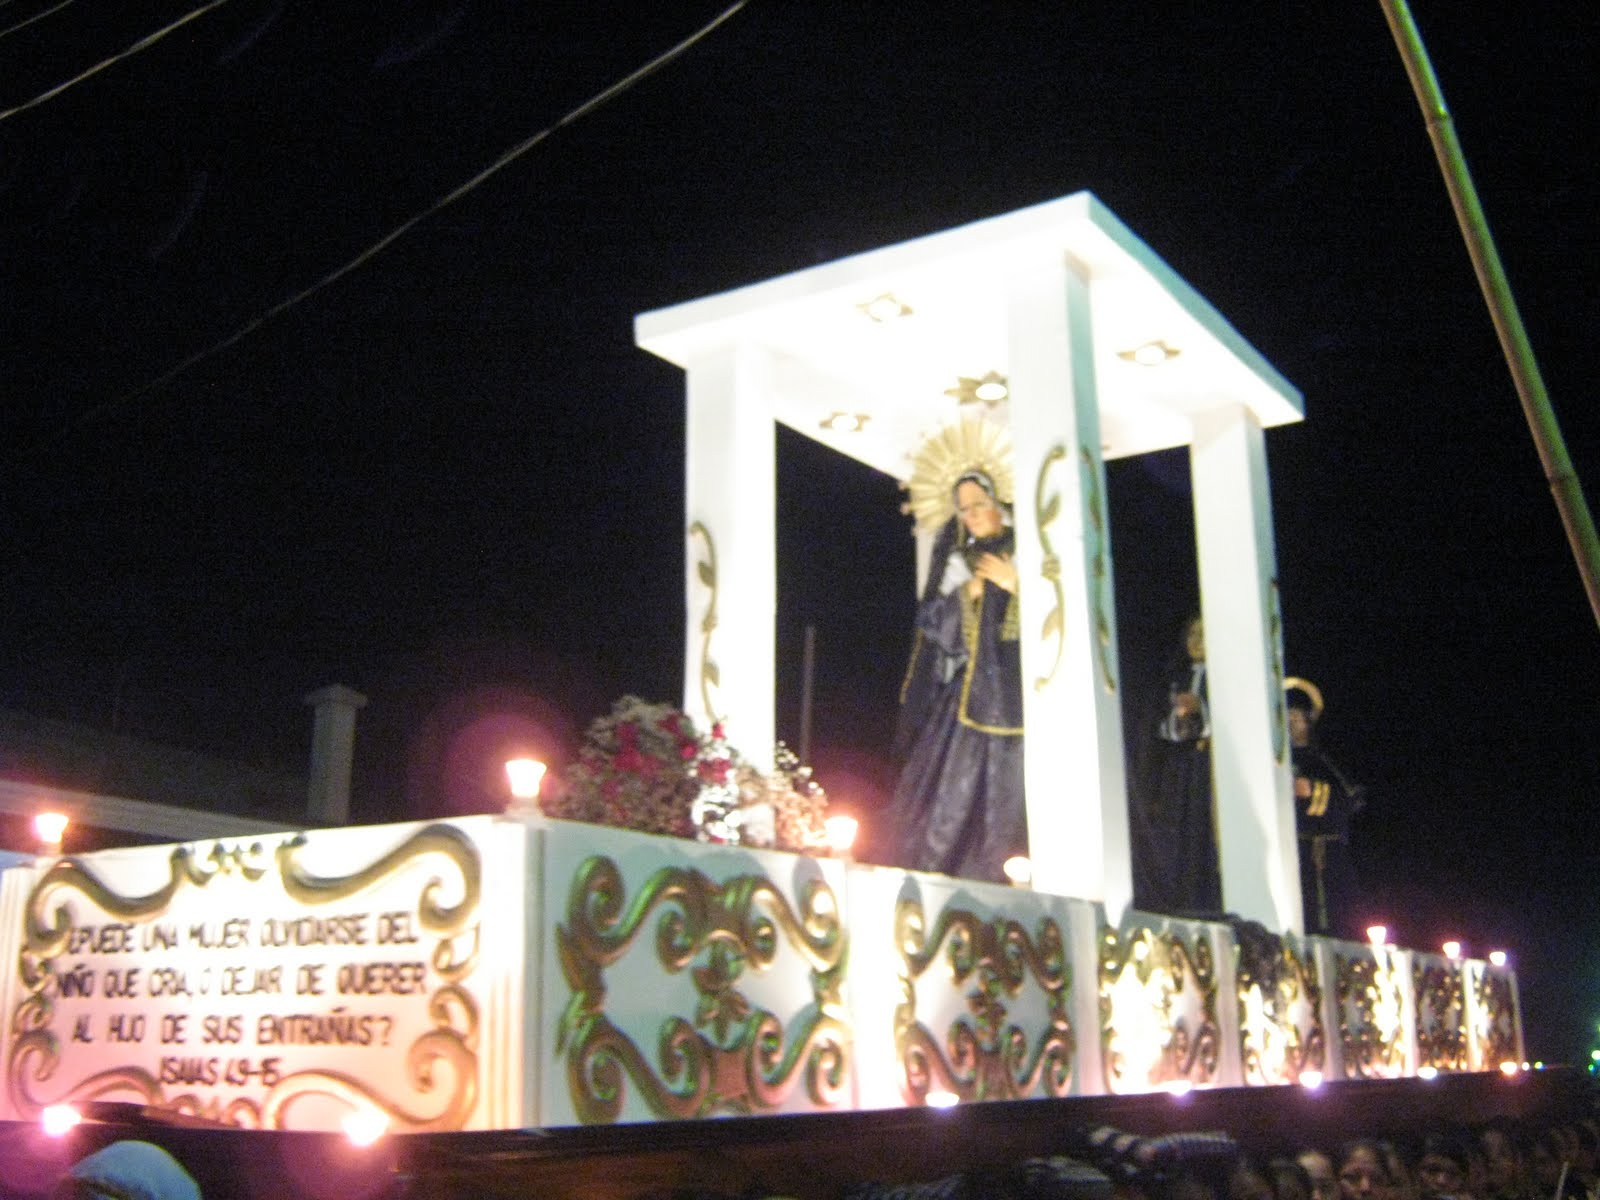 Anna Santos Abril 2010: SAN SEBASTIAN RETALHULEU EN SEMANA SANTA: VIERNES SANTO